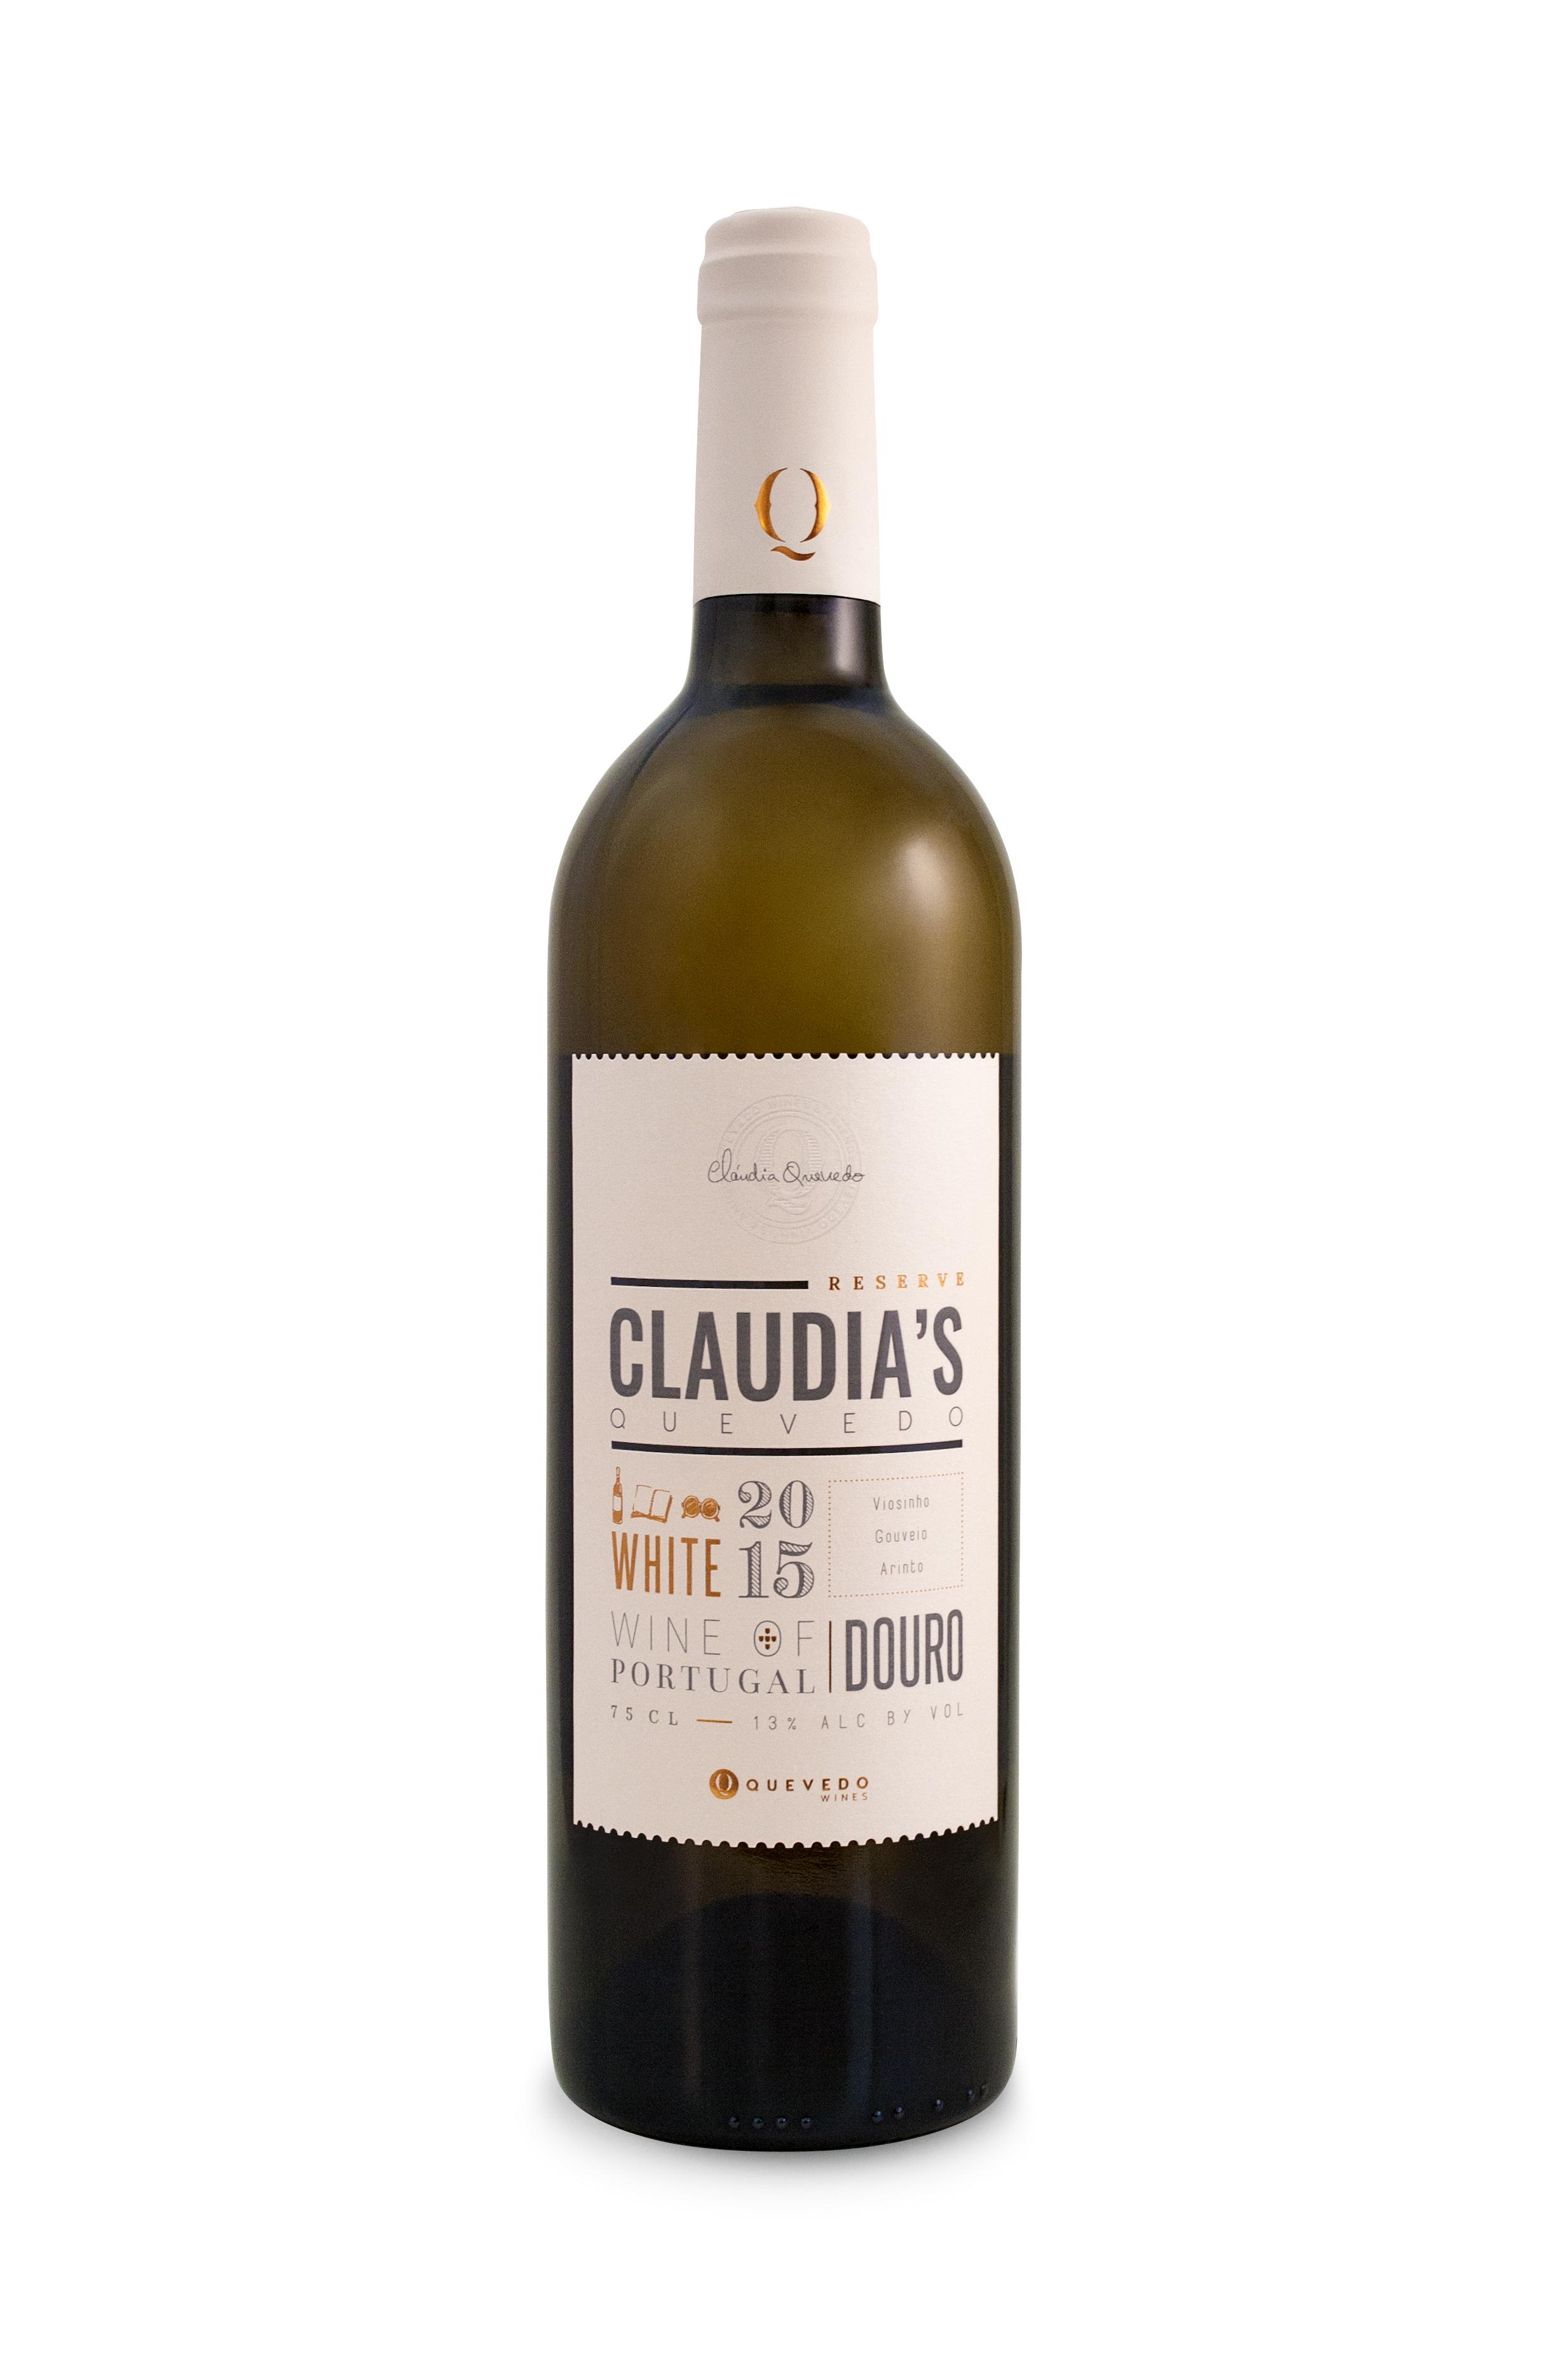 Claudia's Douro Wine | Port Wine Producer in the Douro